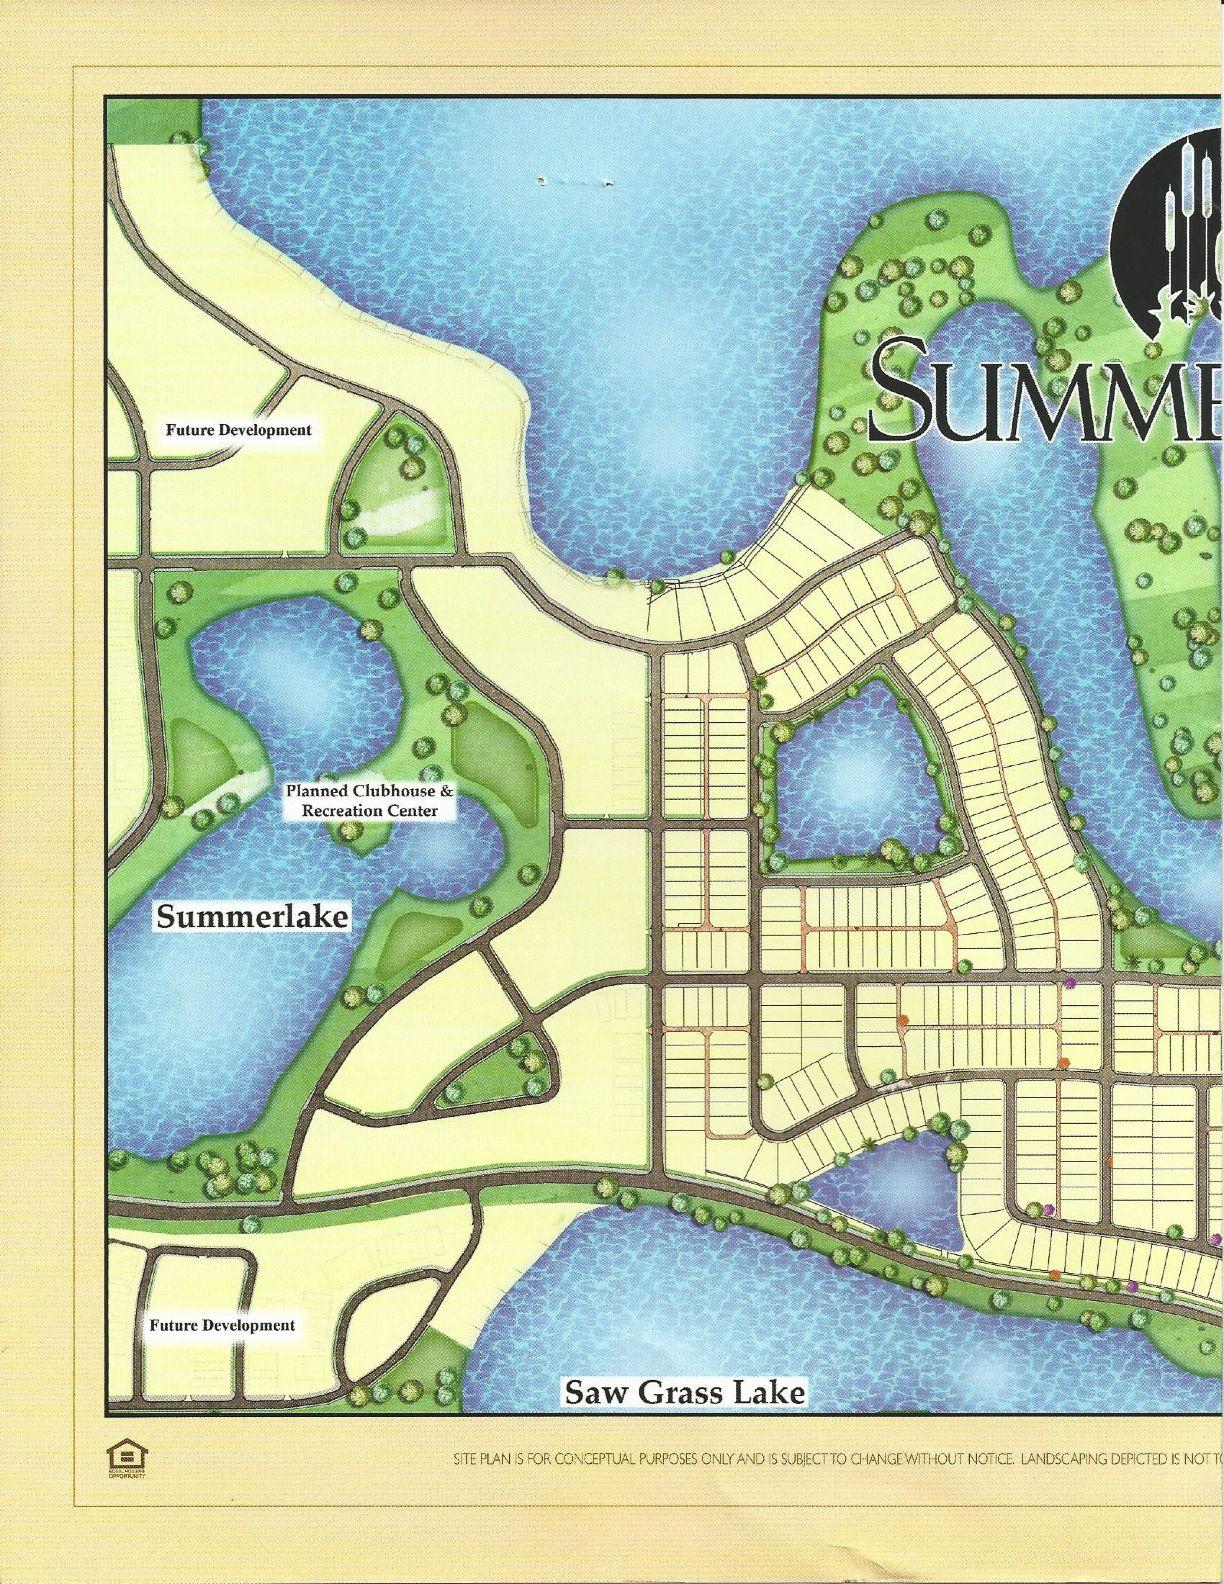 summerlake center line homes east side site plan in winter garden